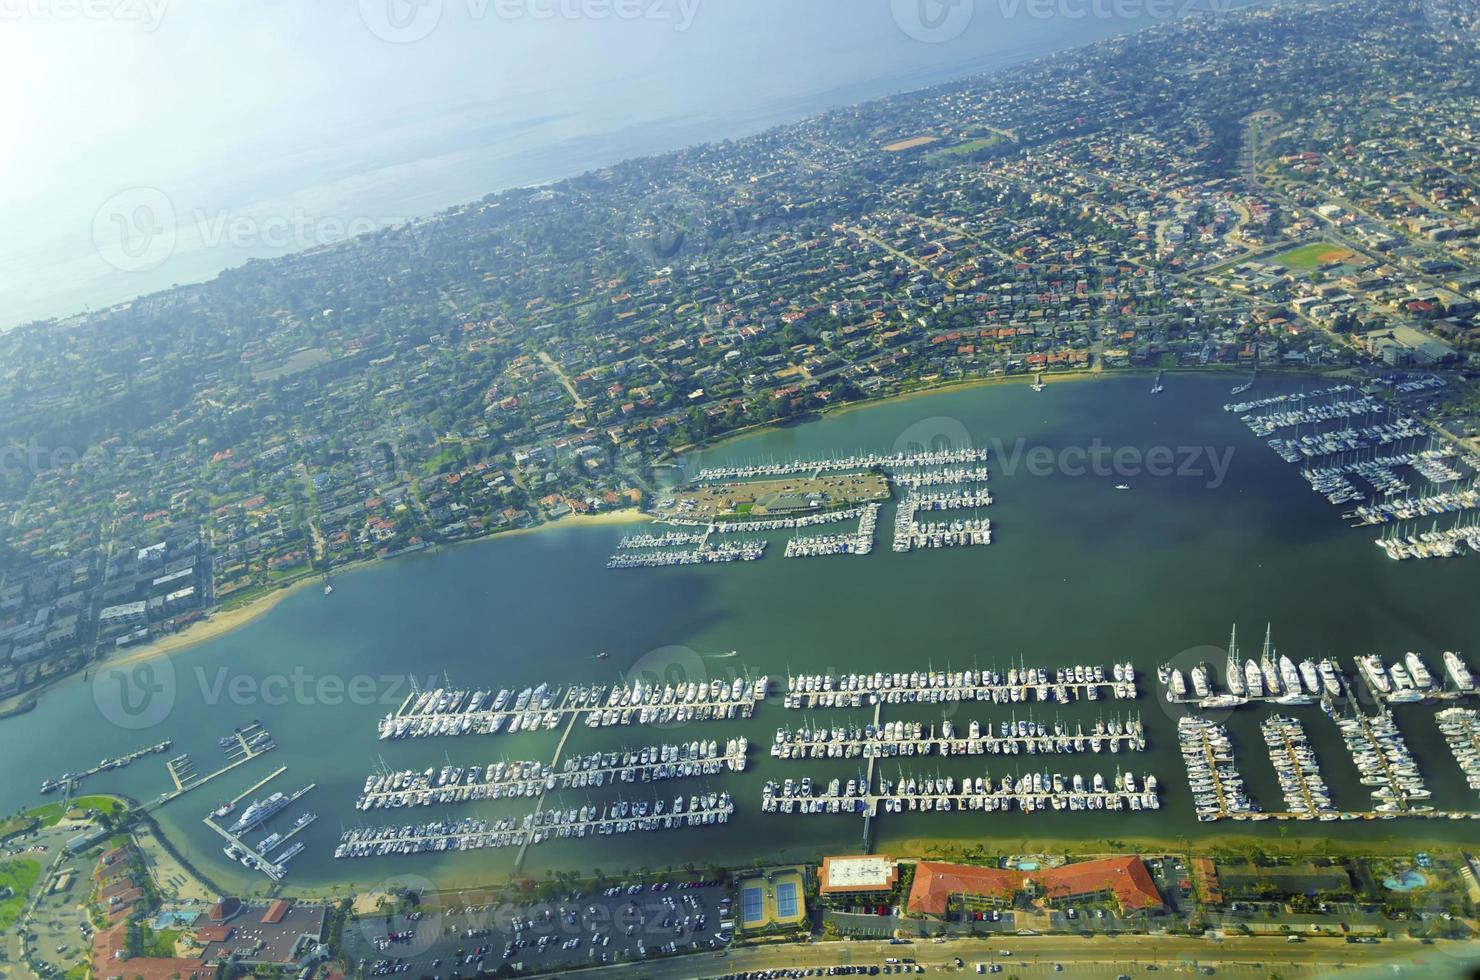 Luchtfoto van Point Loma, San Diego foto